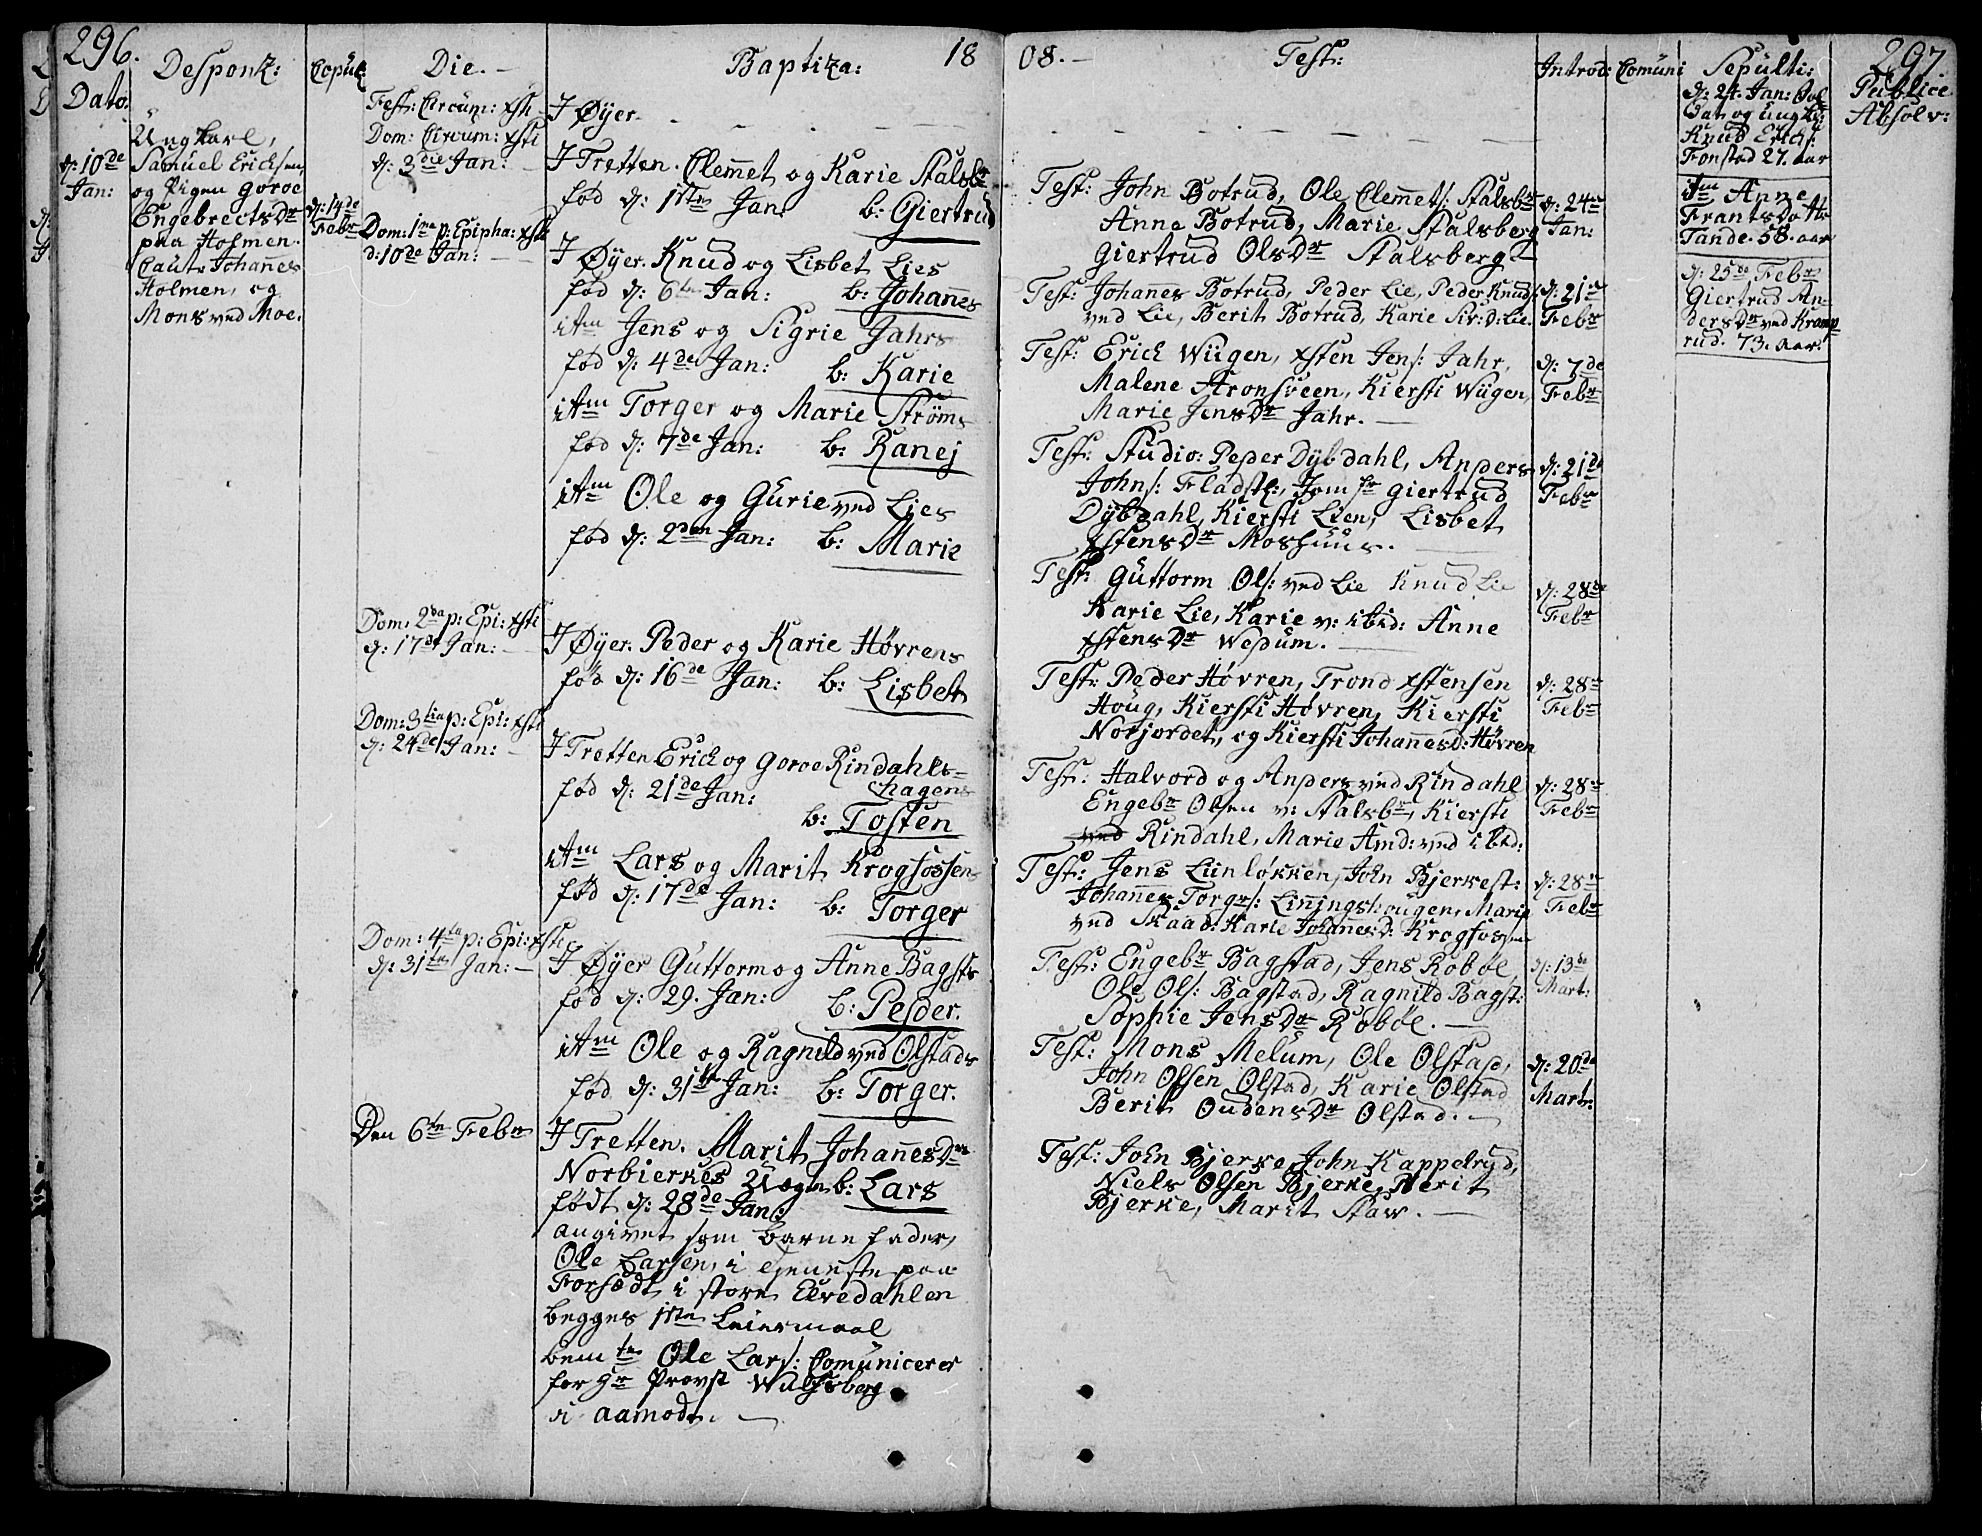 SAH, Øyer prestekontor, Ministerialbok nr. 3, 1784-1824, s. 296-297